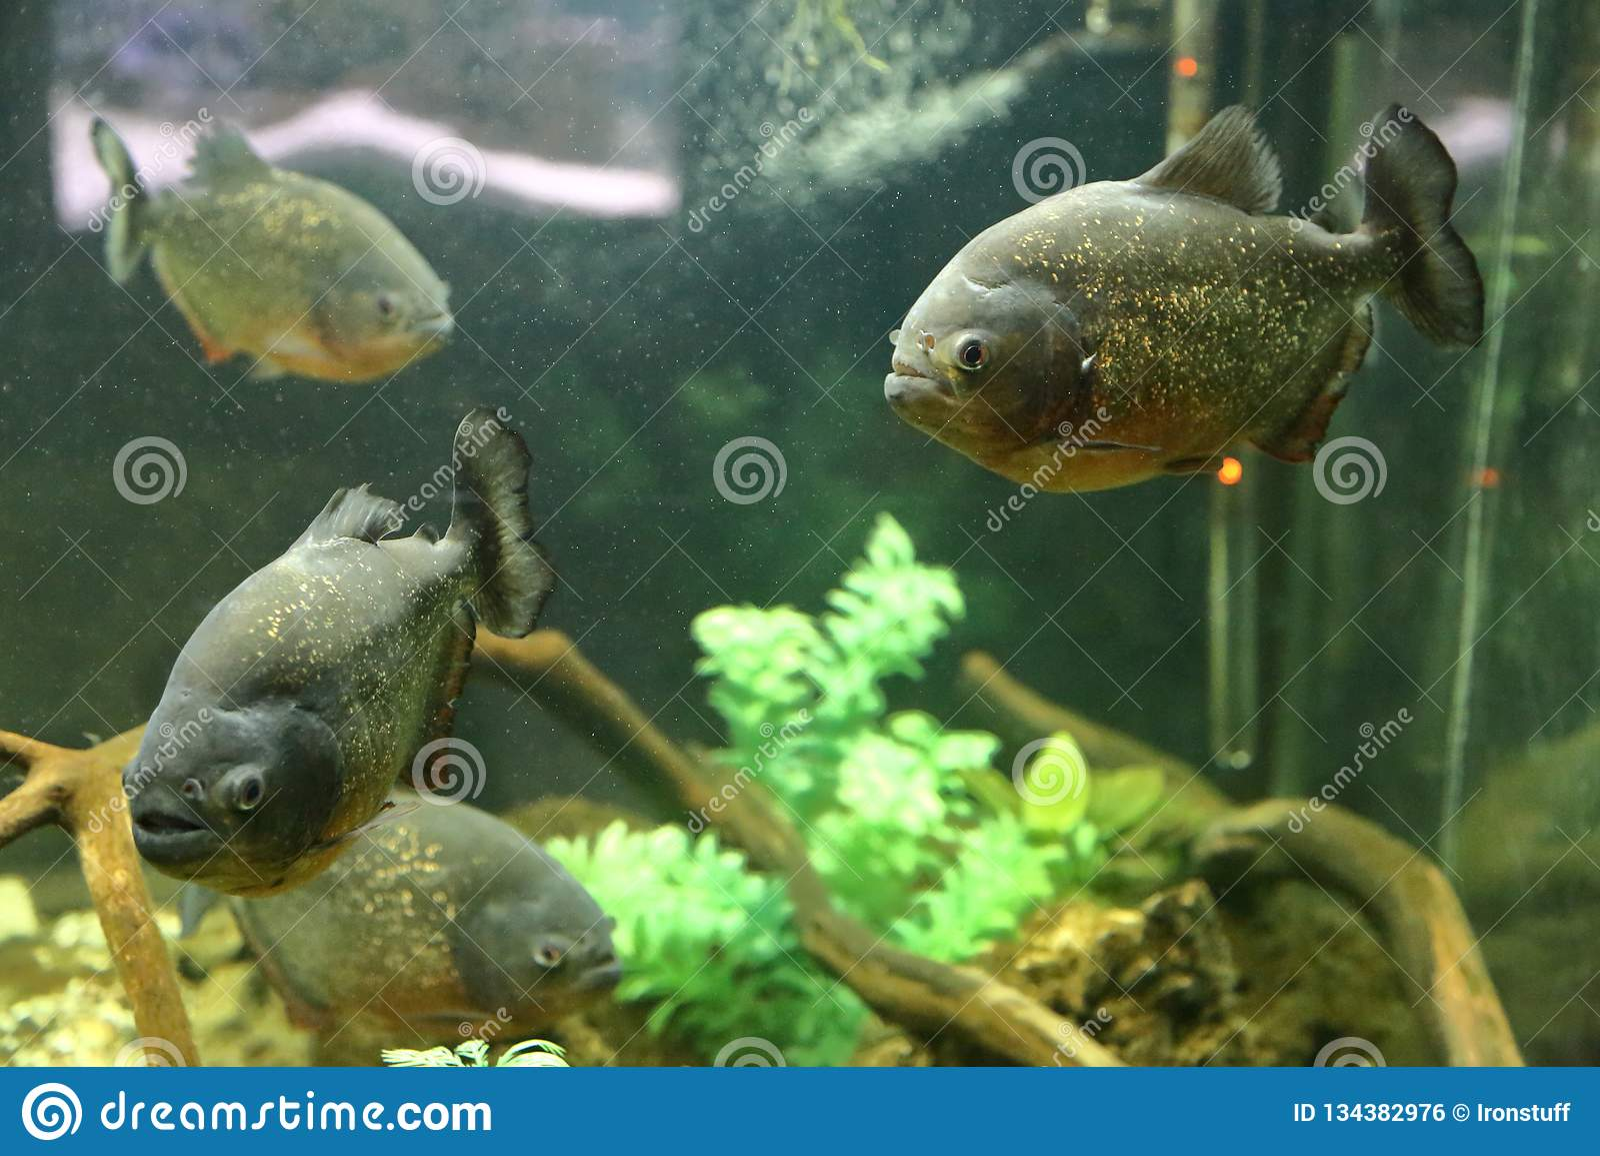 The Idea Of Home Aquarium Decoration Stock Photo Image Of